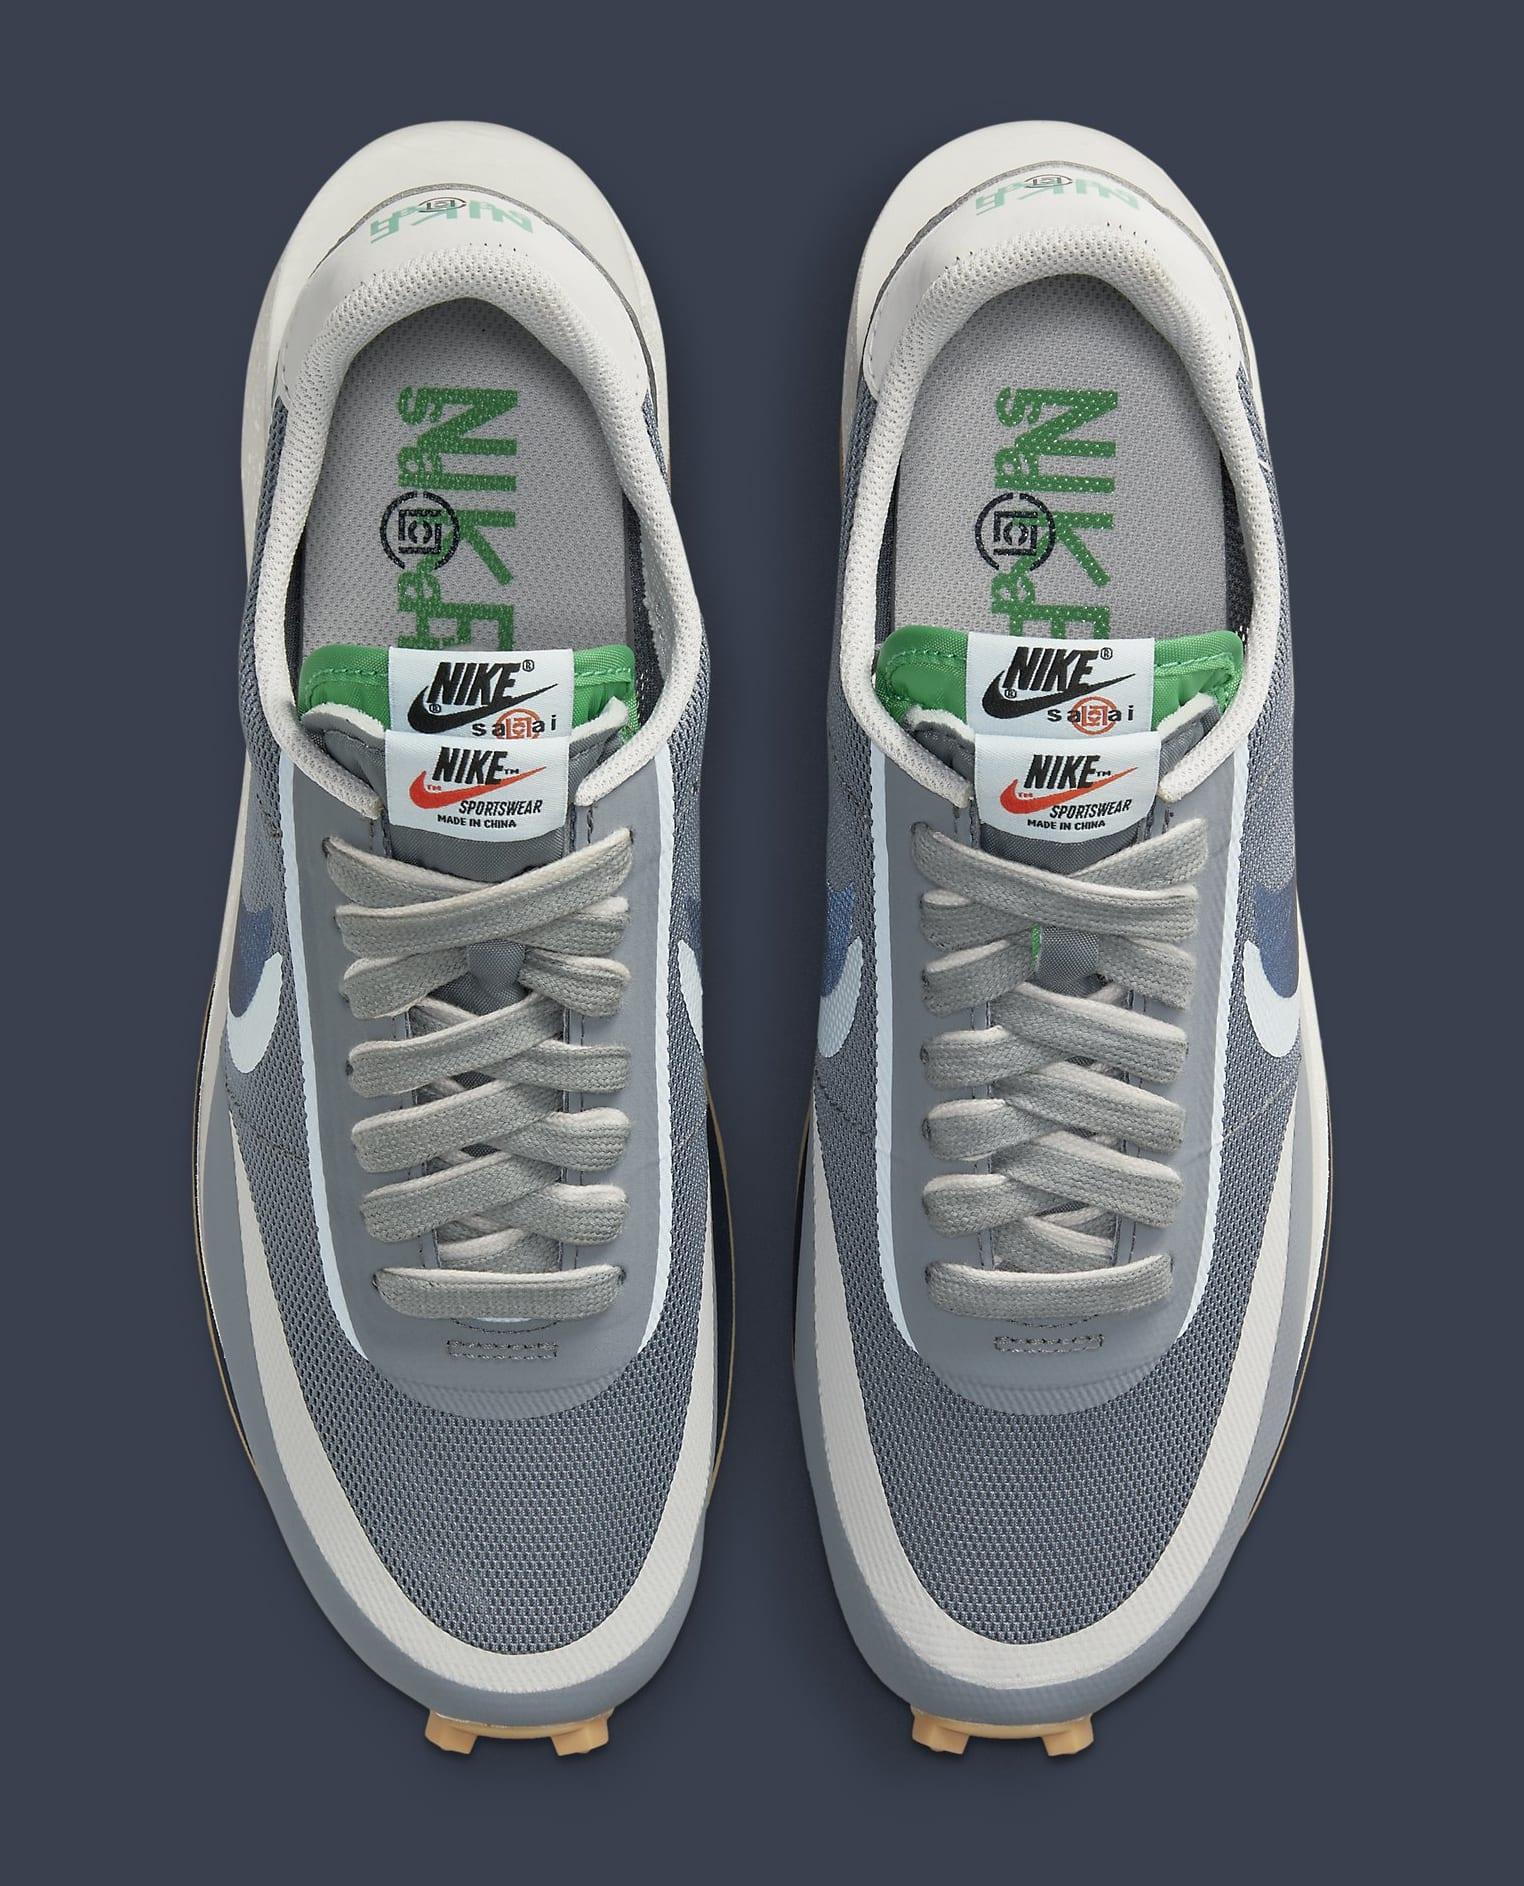 Clot x Sacai x Nike LDWaffle 'Cool Grey' DH3114-001 Top